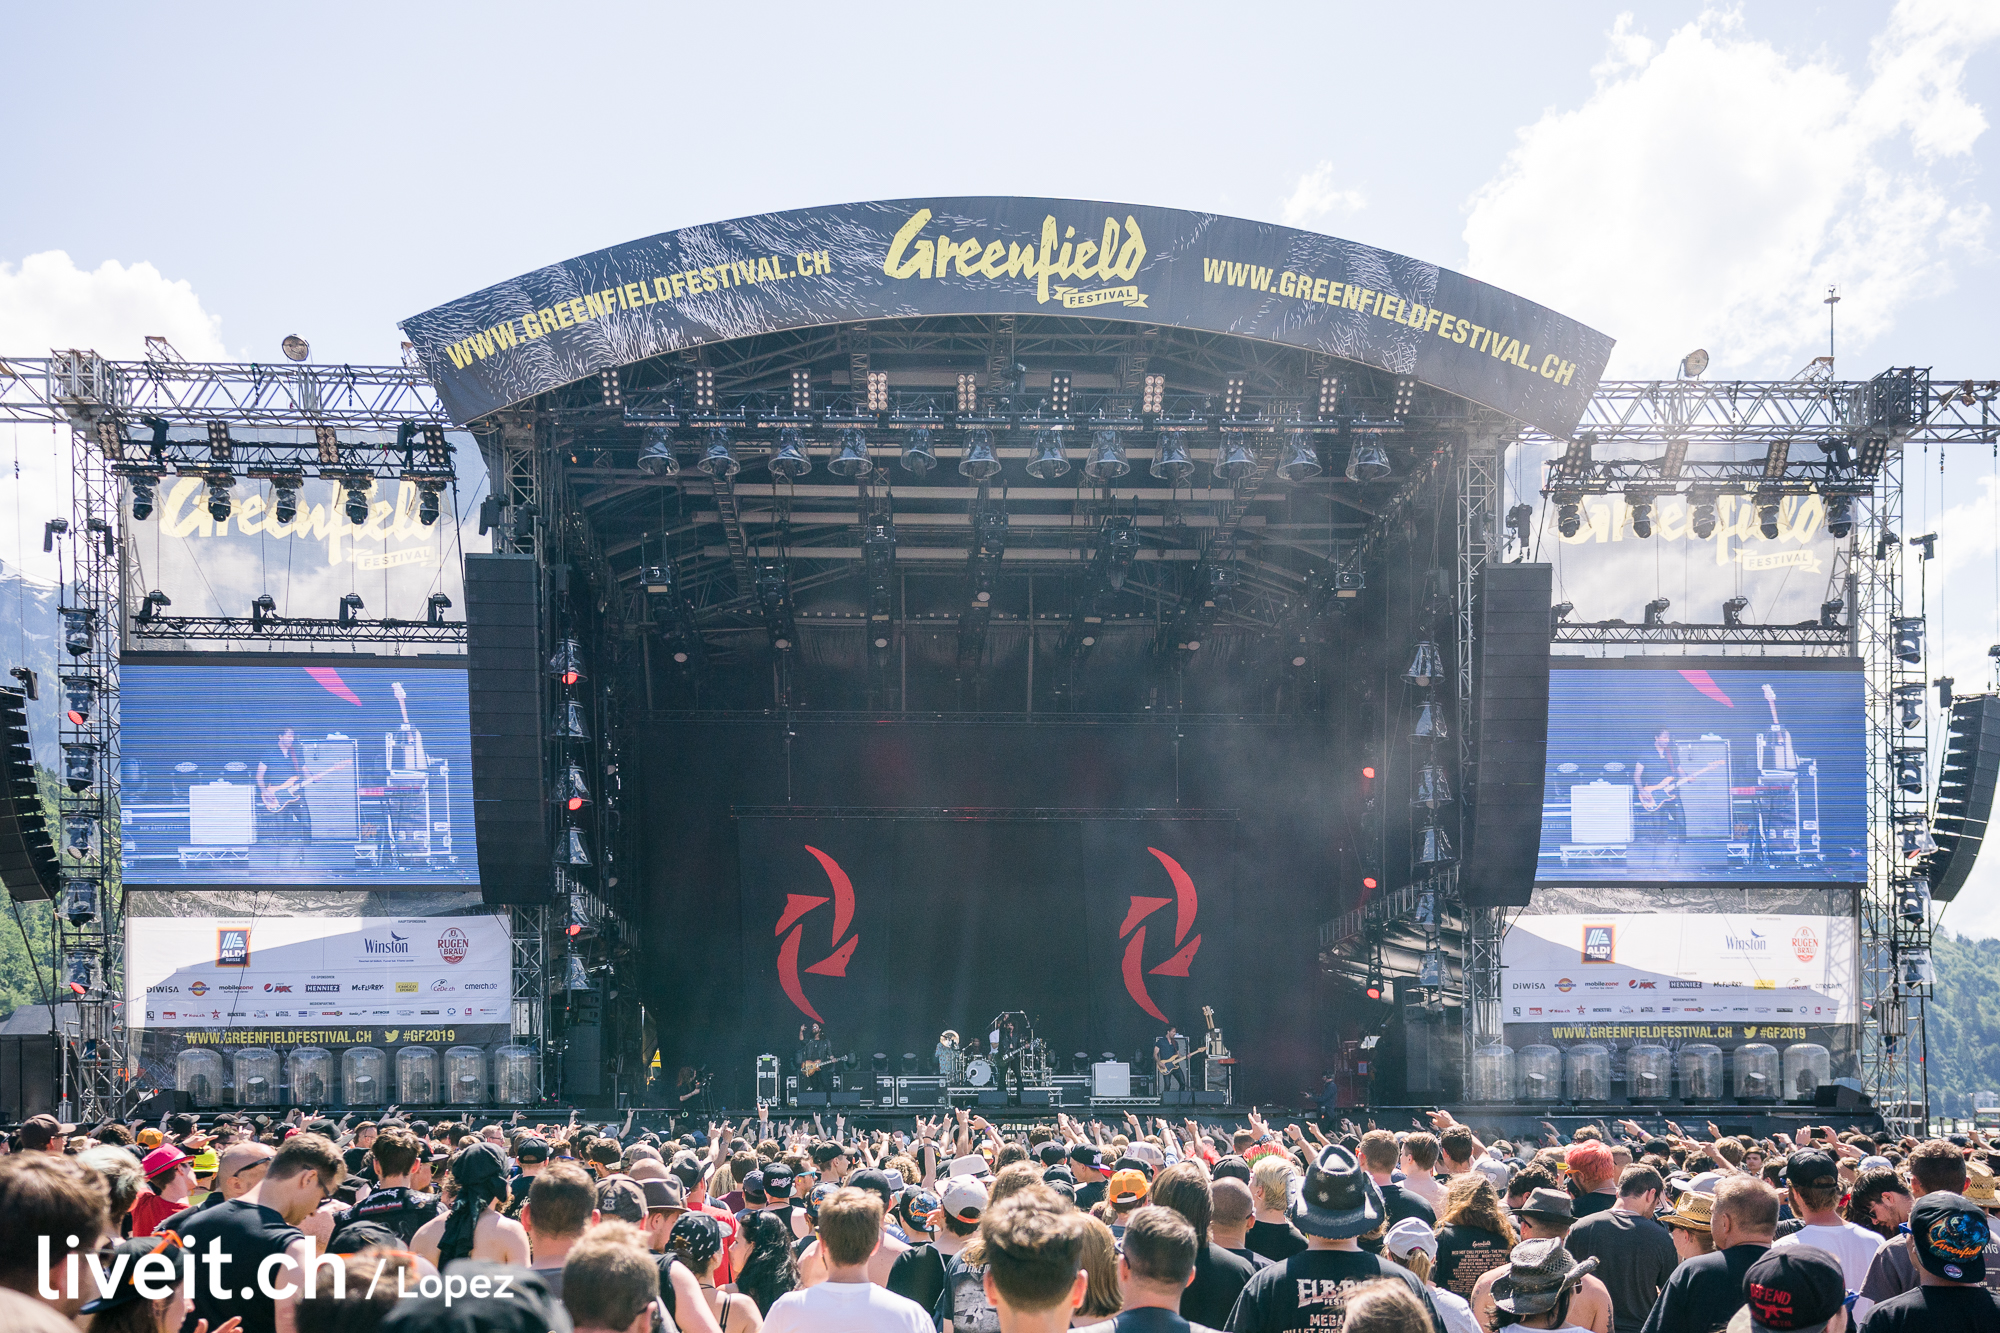 SCHWEIZ GREENFIELD FESTIVAL 2019 Halestorm